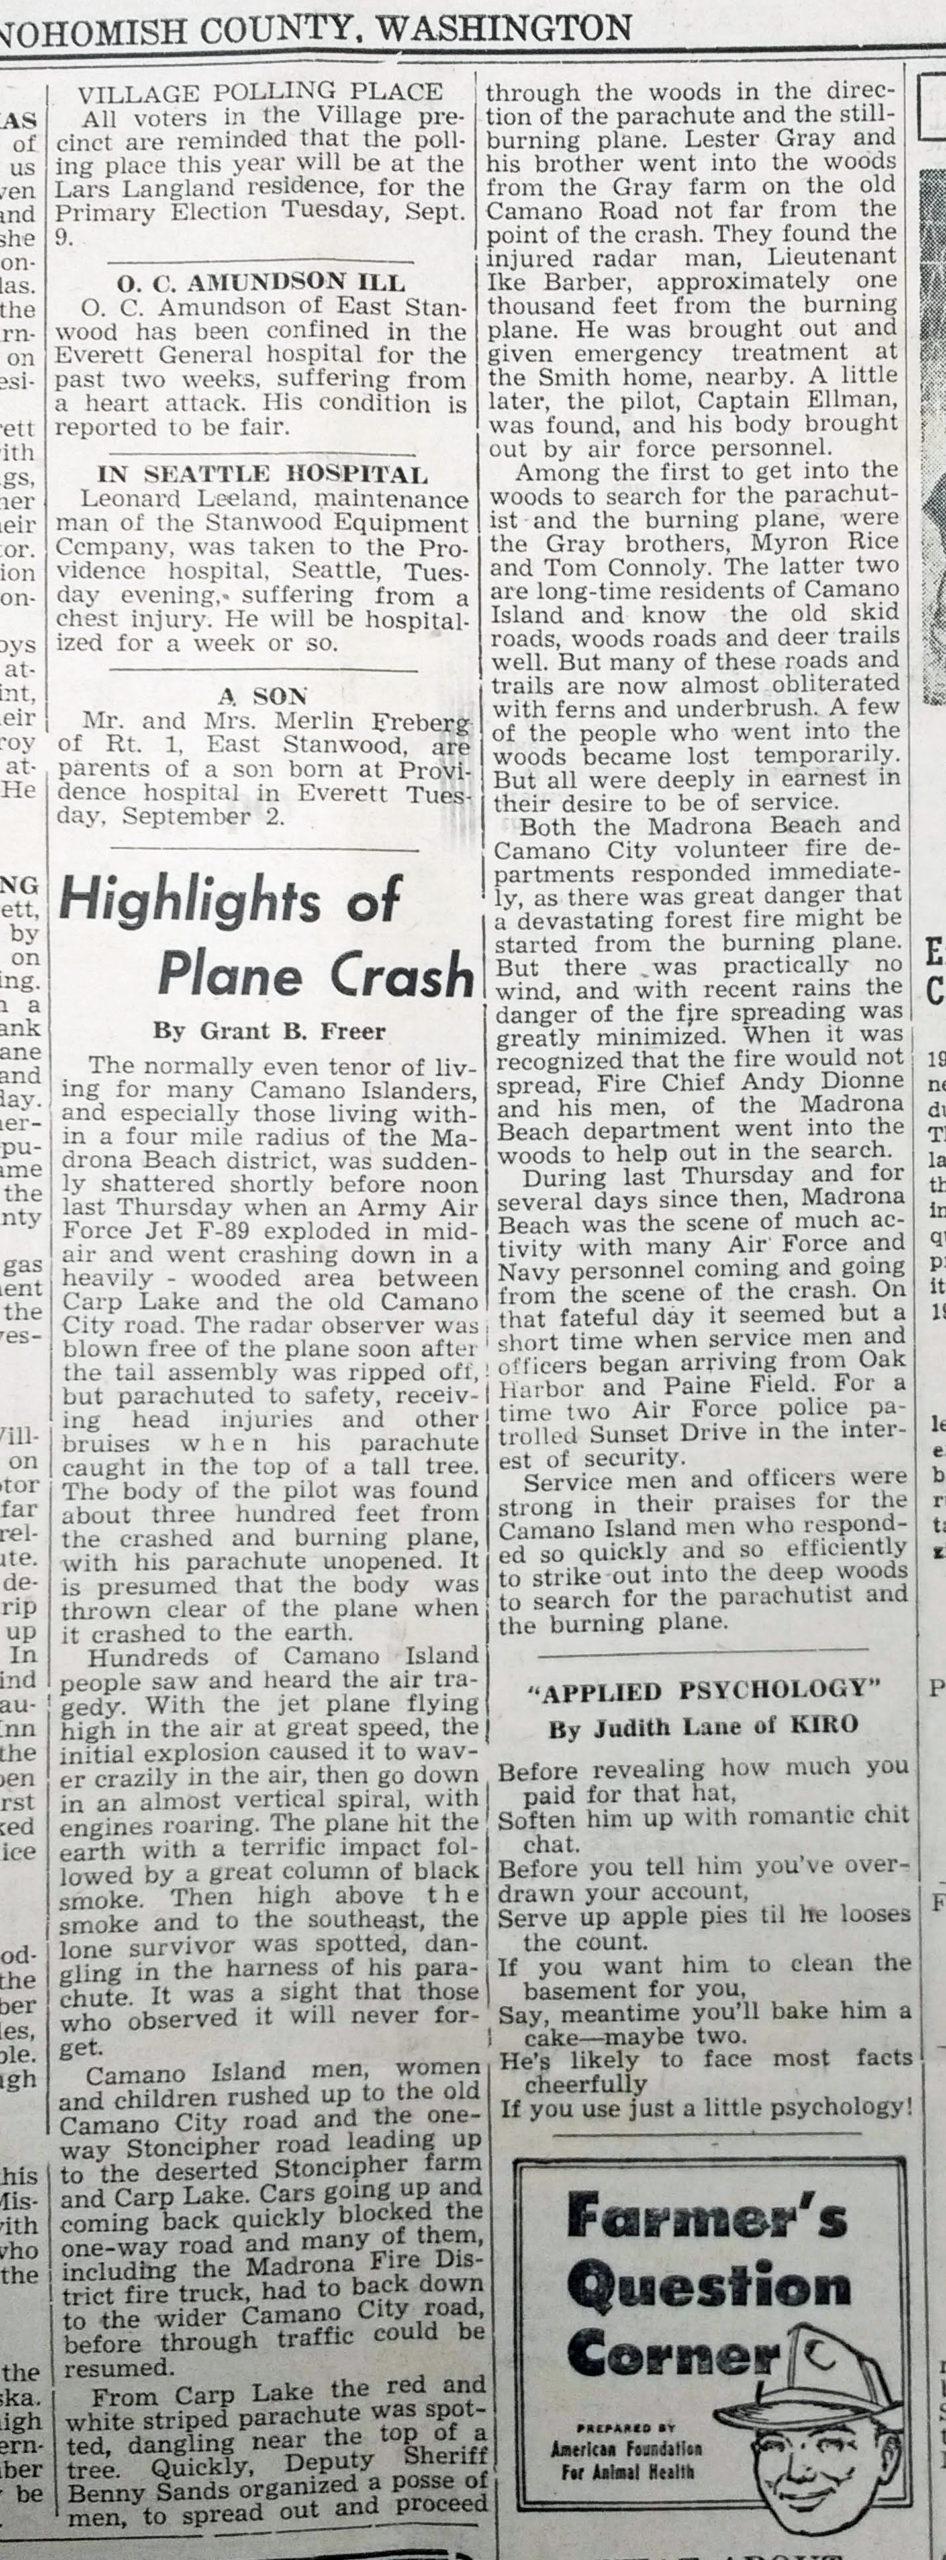 Plane Crash over Camano 1952